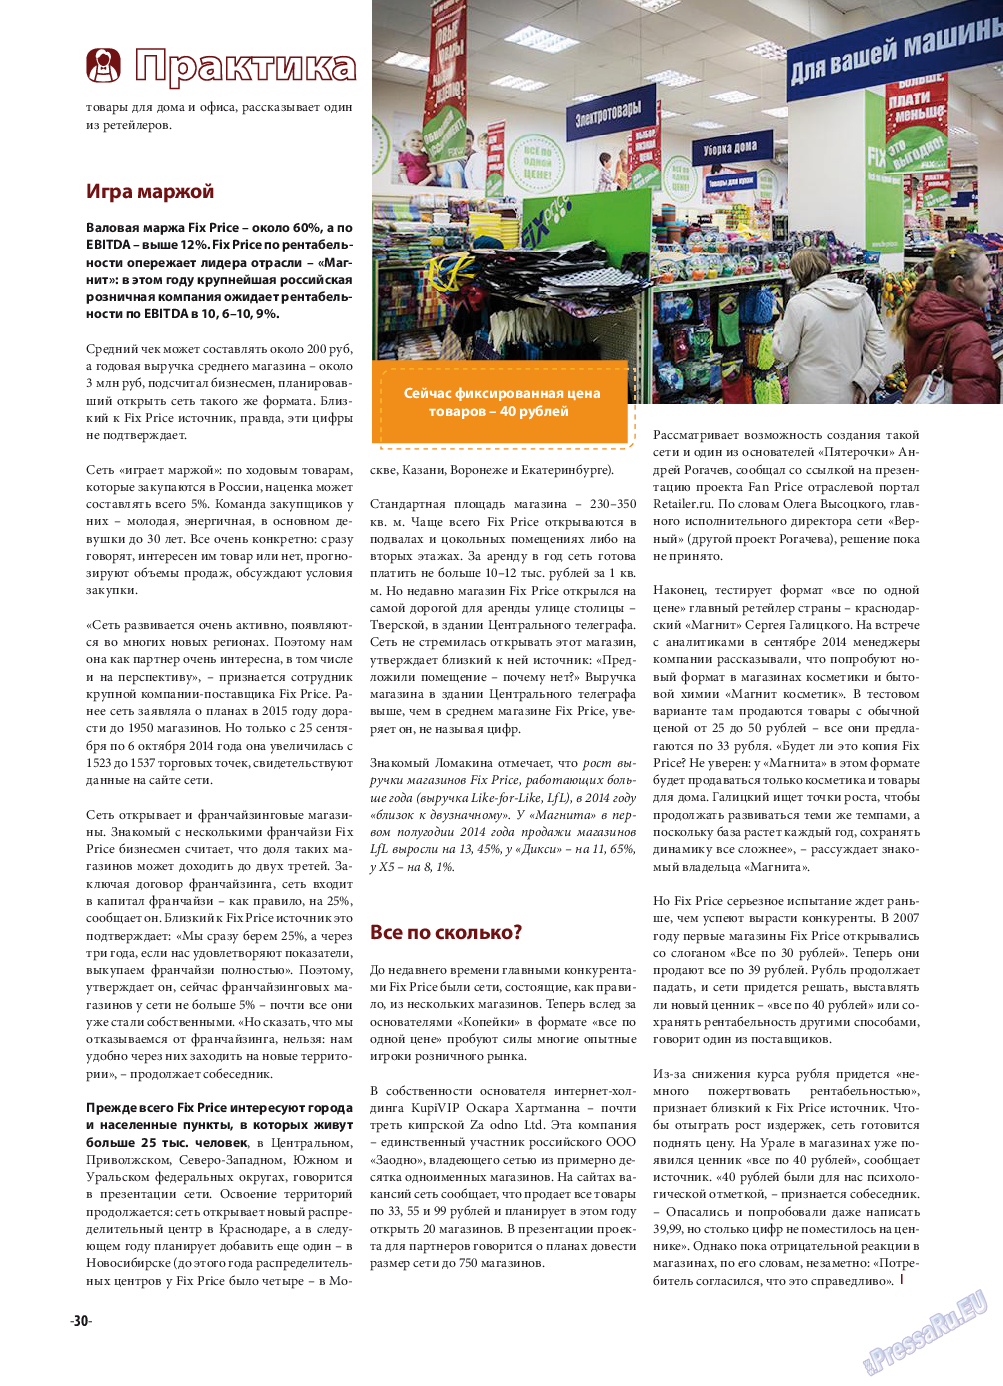 iDEAL (журнал). 2015 год, номер 4, стр. 30